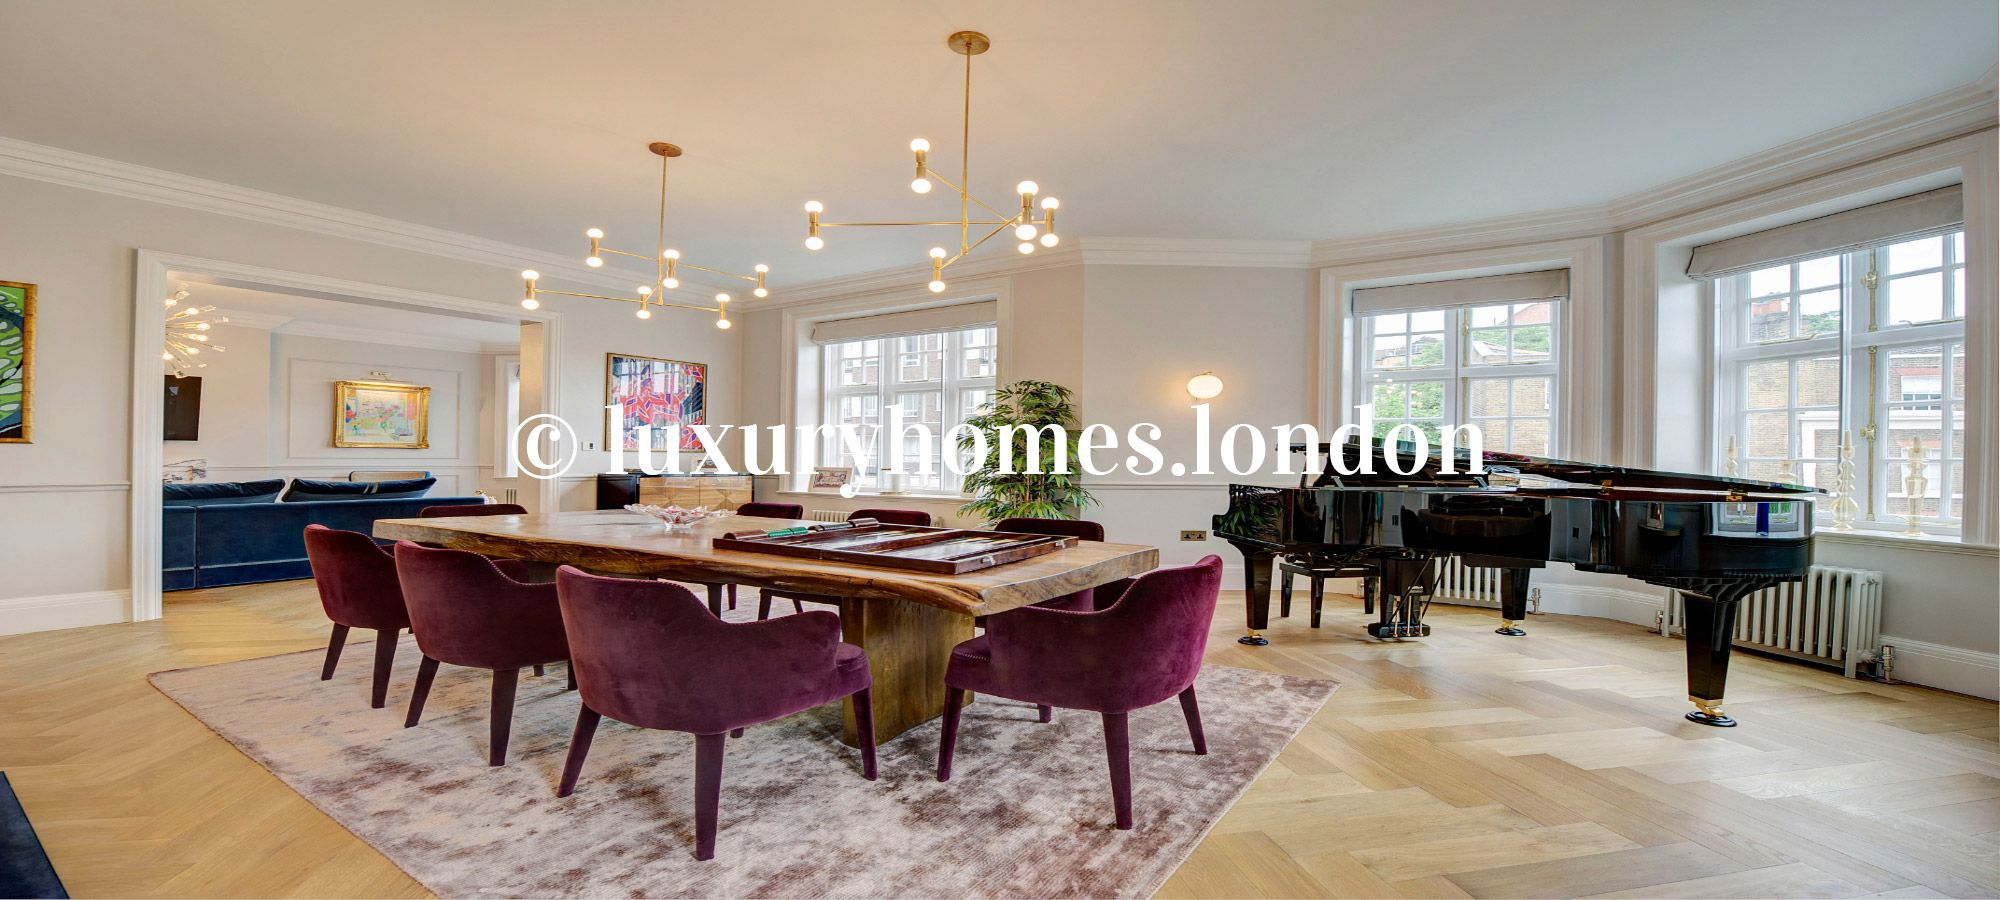 Luxury Homes in London in 2020 | Luxury homes in london ...